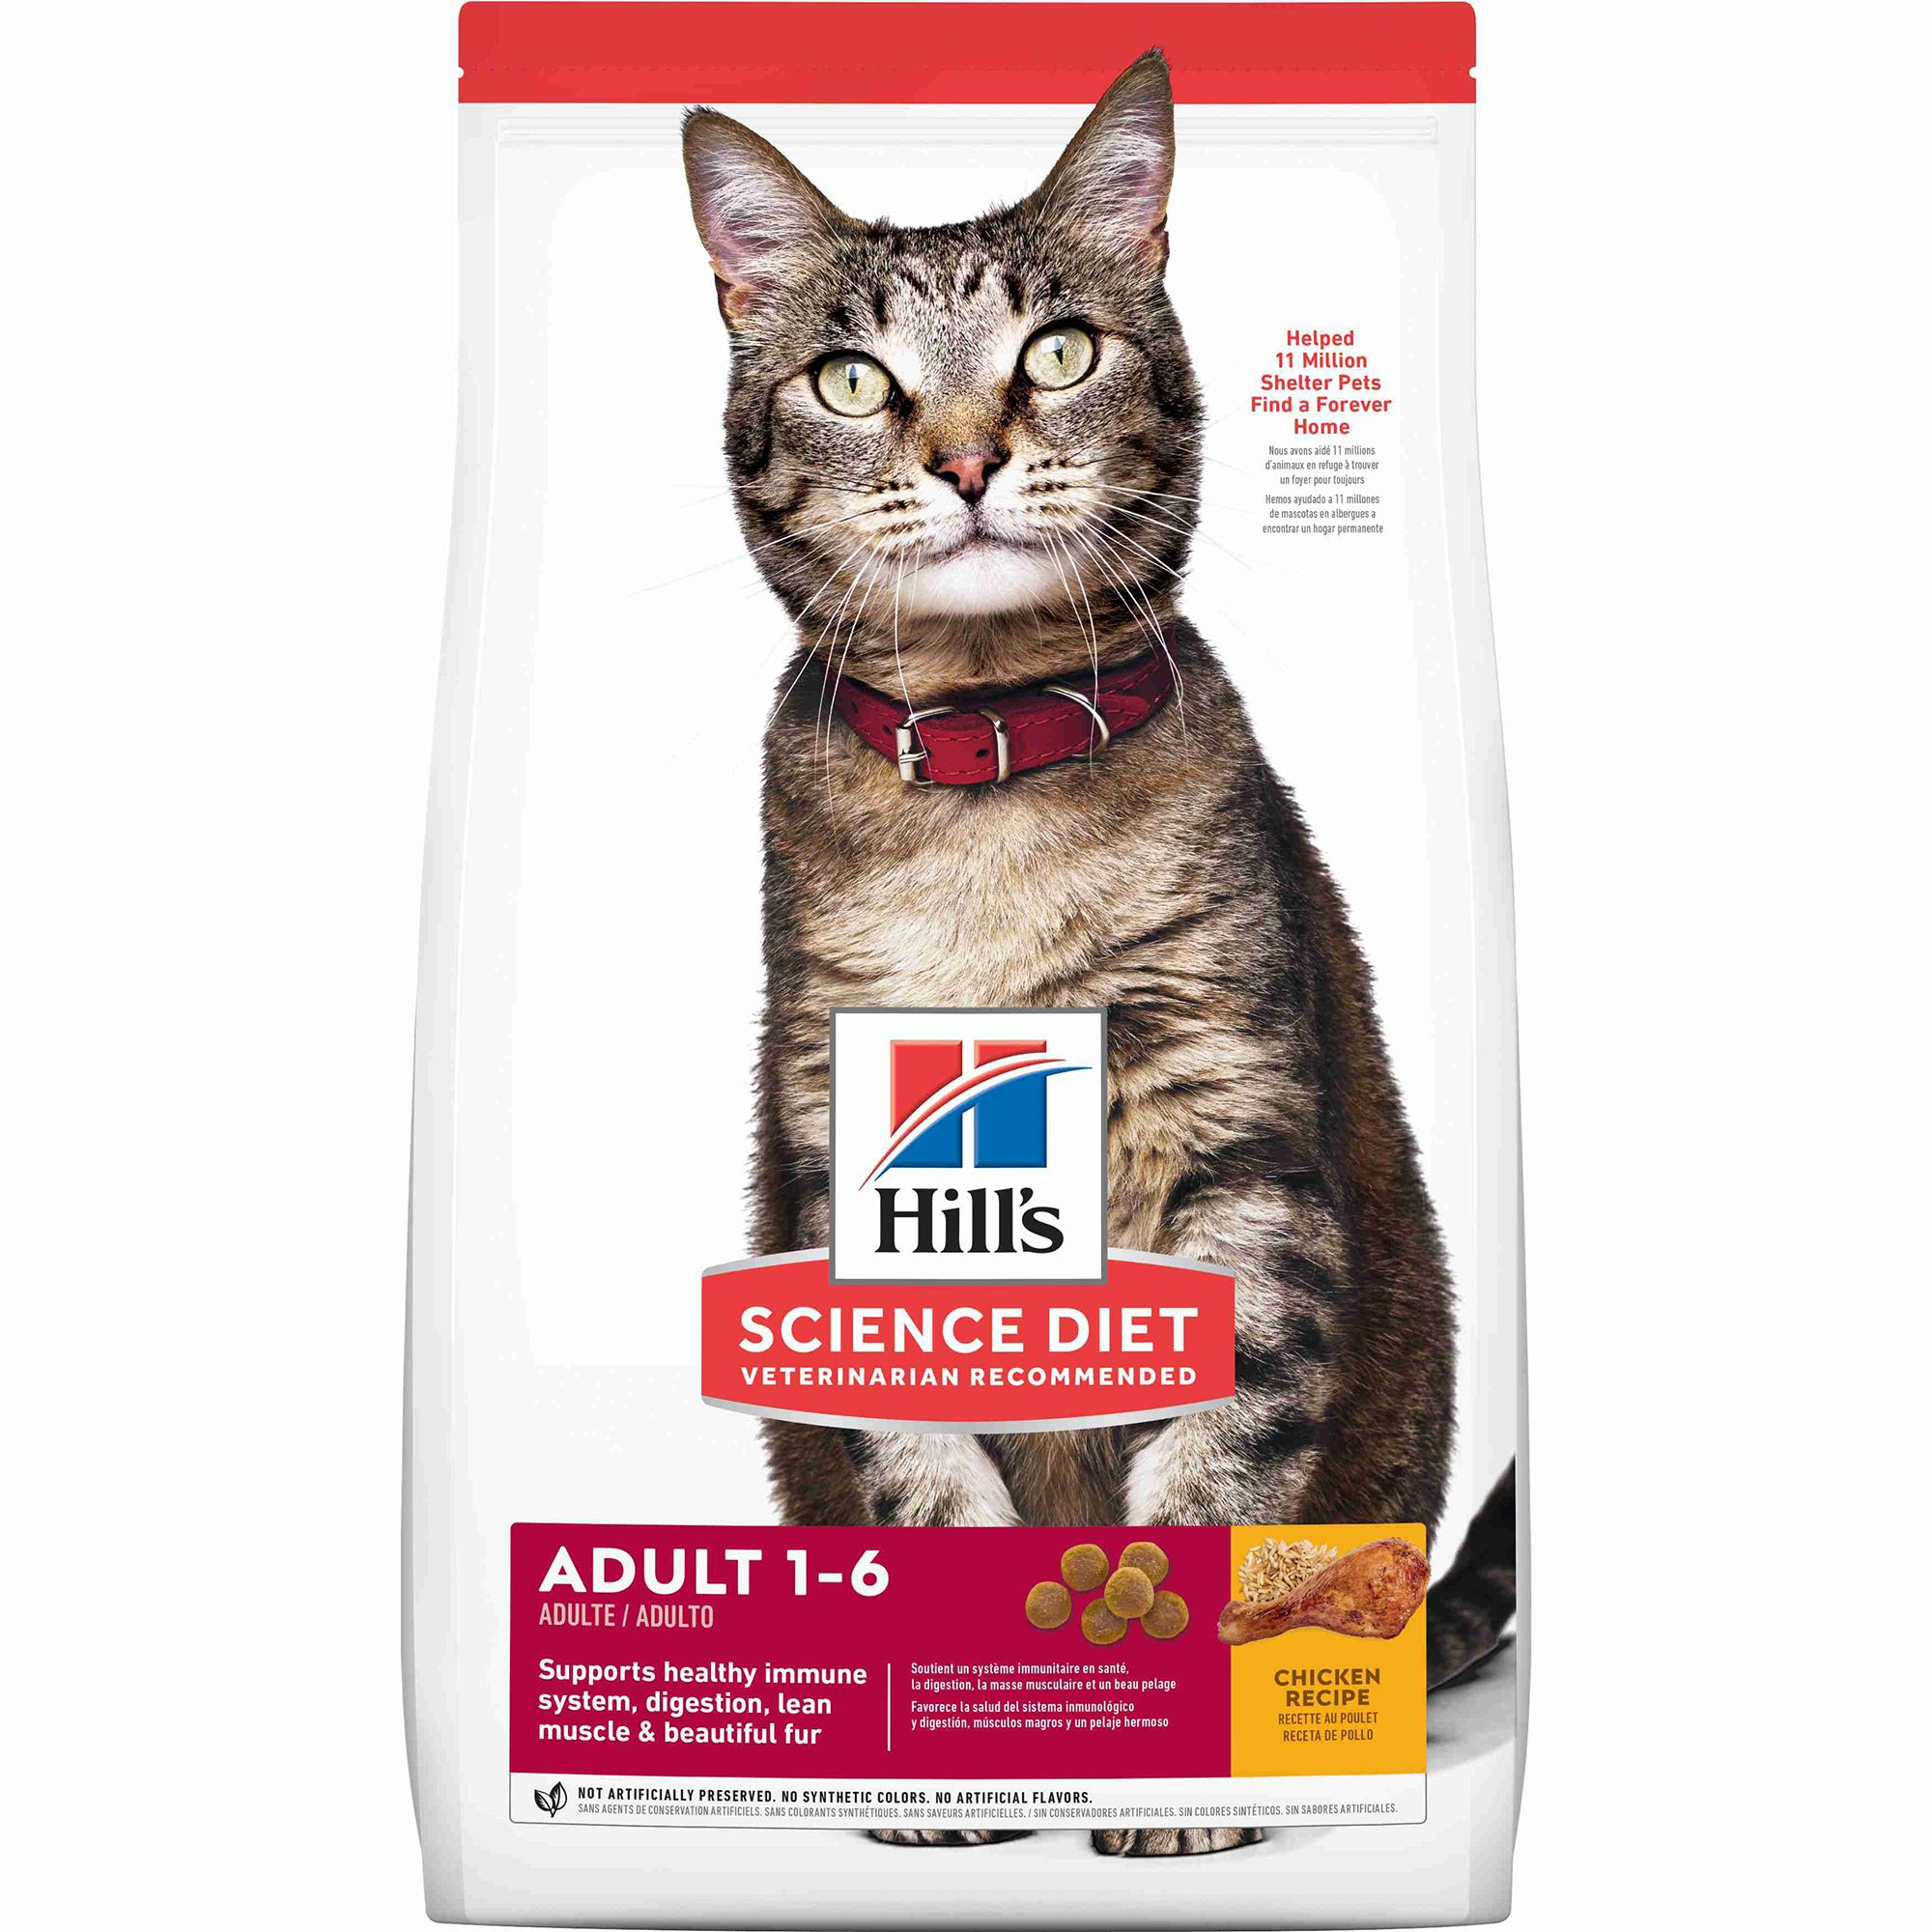 science diet cat food at petsmart